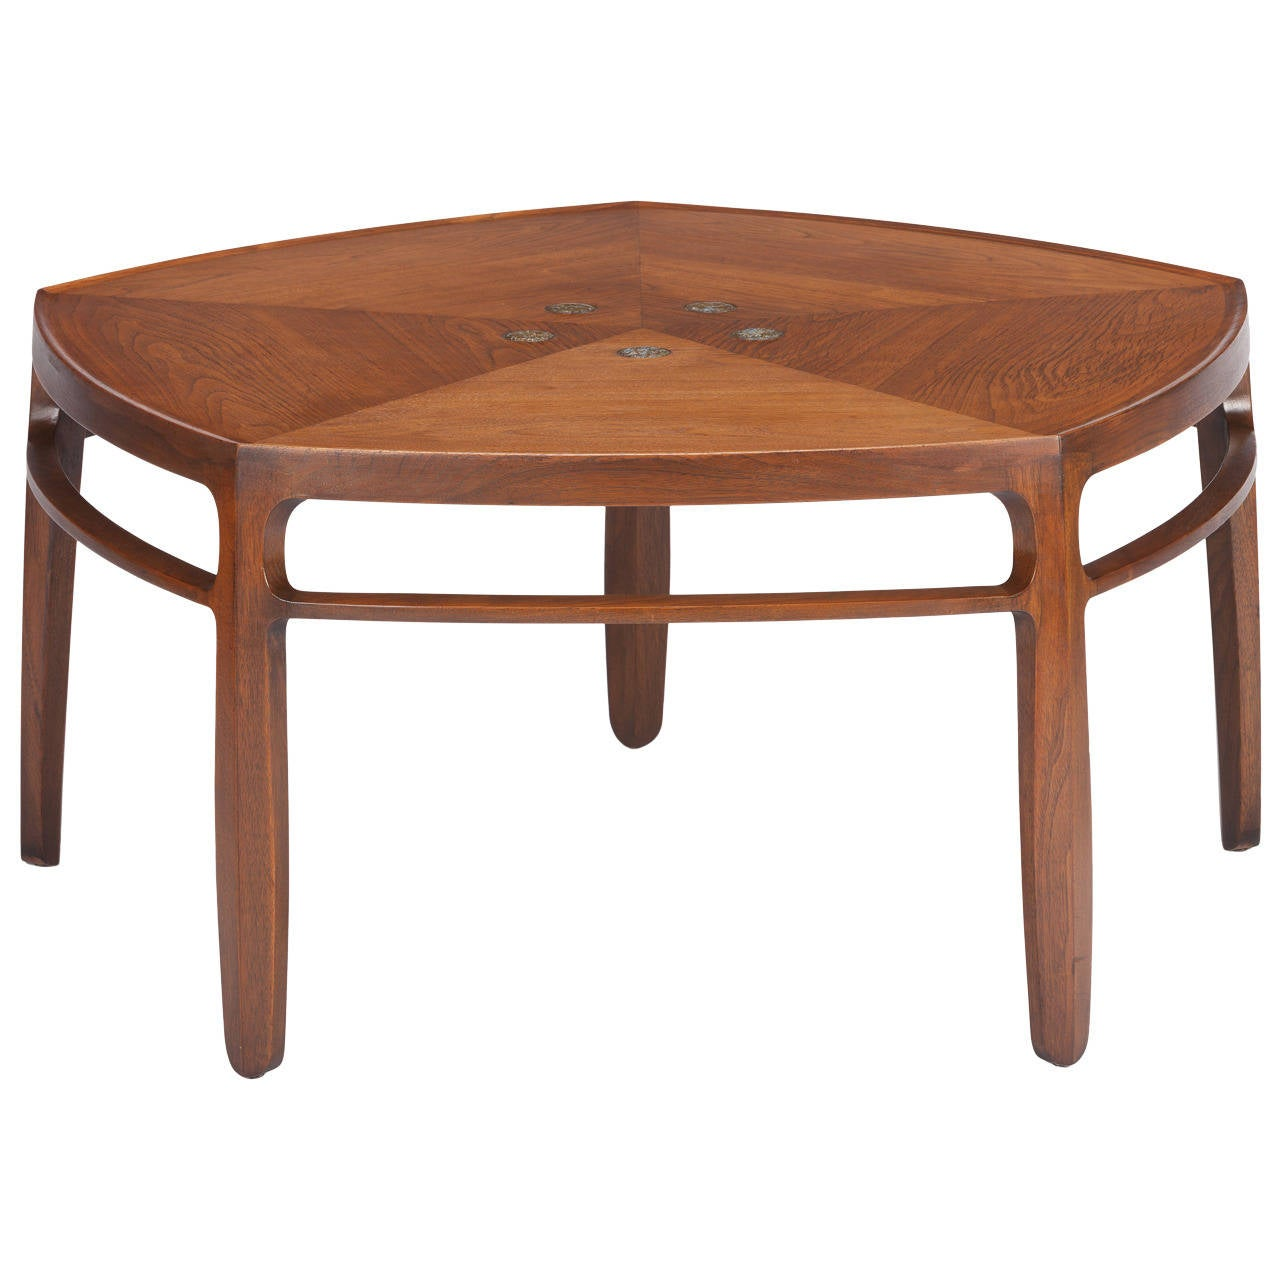 Edward Wormley Natzler Tiled Coffee Table For Dunbar At 1stdibs